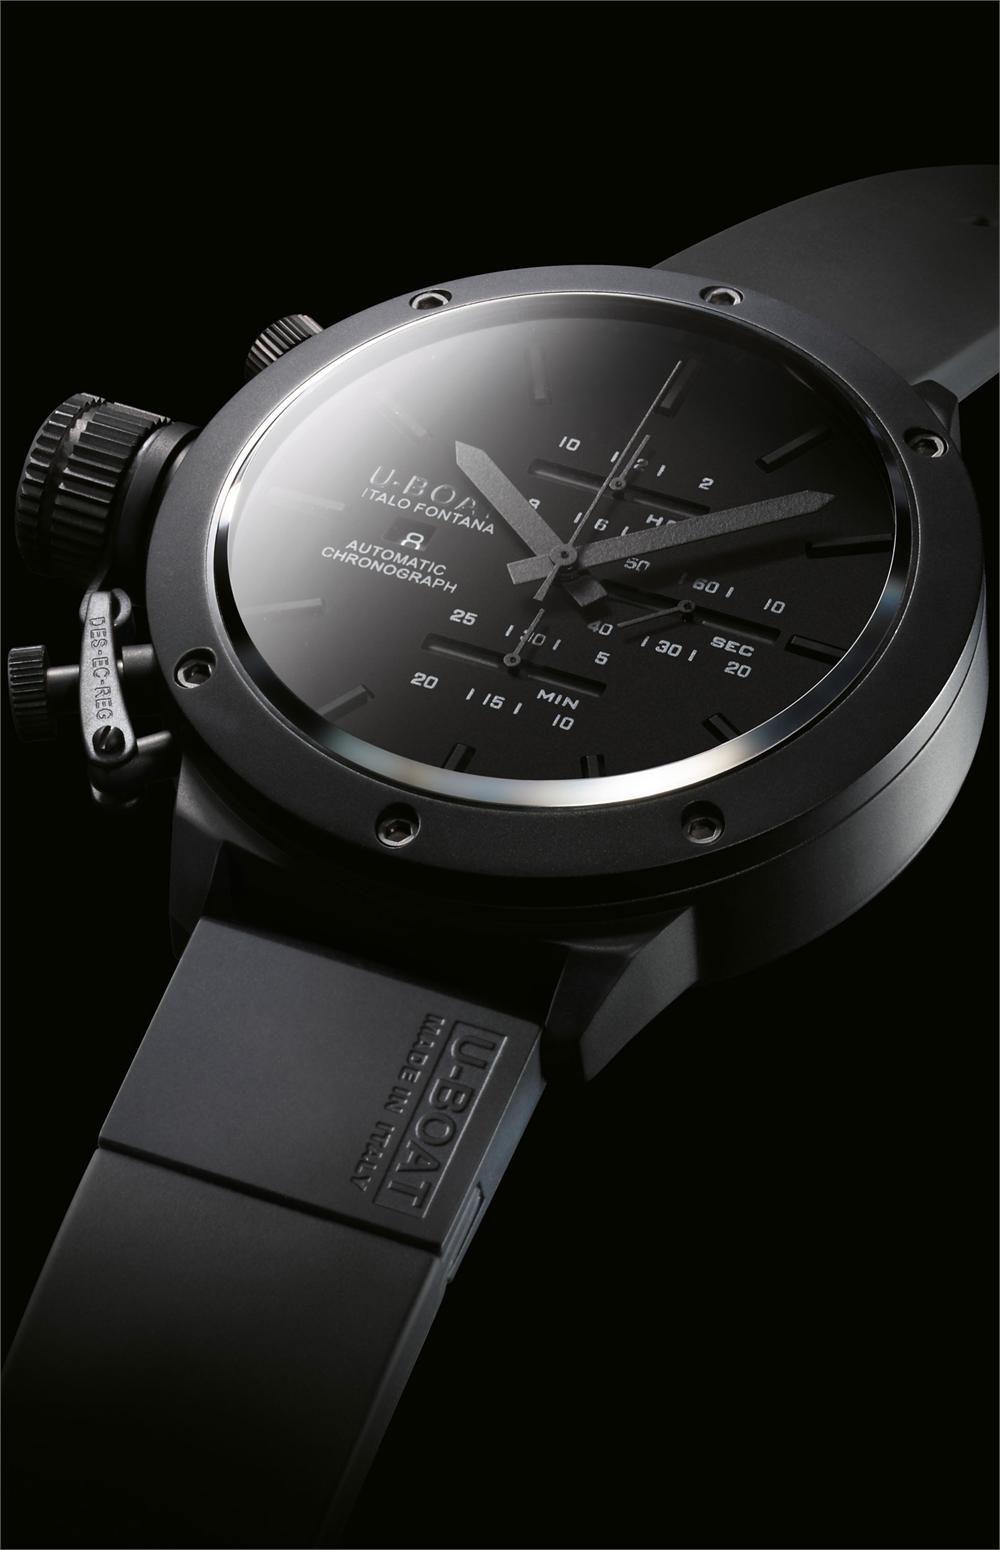 #U-Boat Classico 53 Titanium Limited Edition Automatic Chronograph